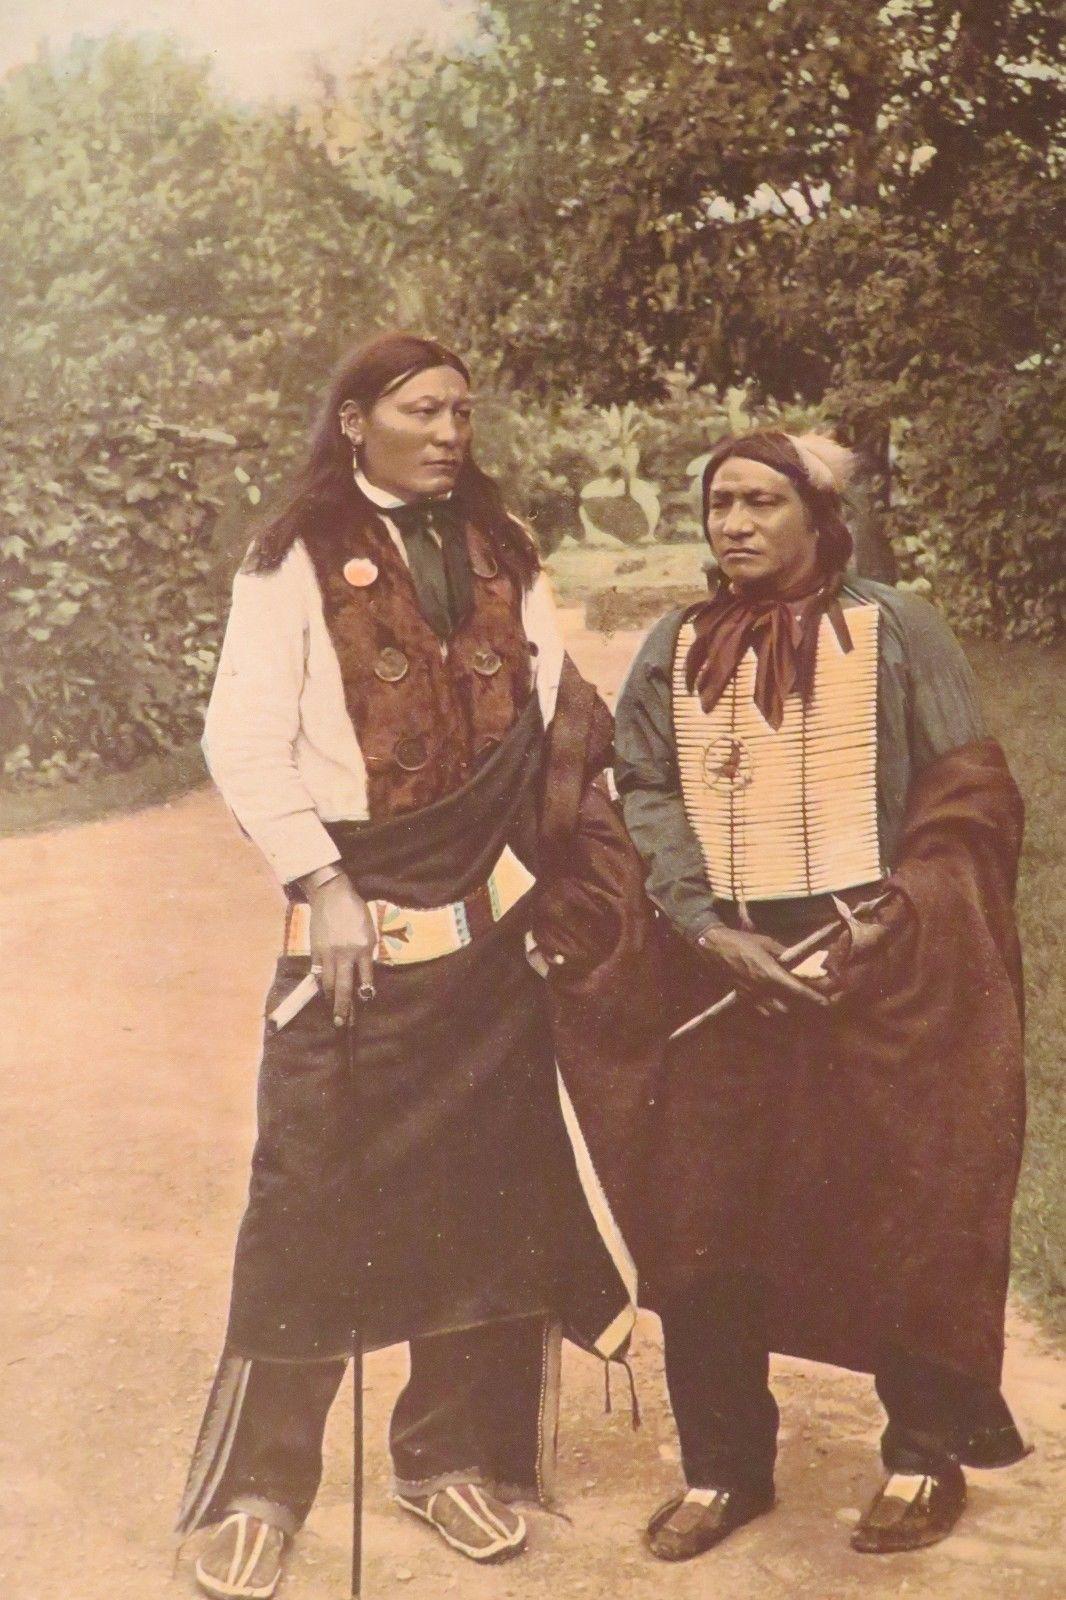 http://www.american-tribes.com/messageboards/dietmar/medicine2.jpg